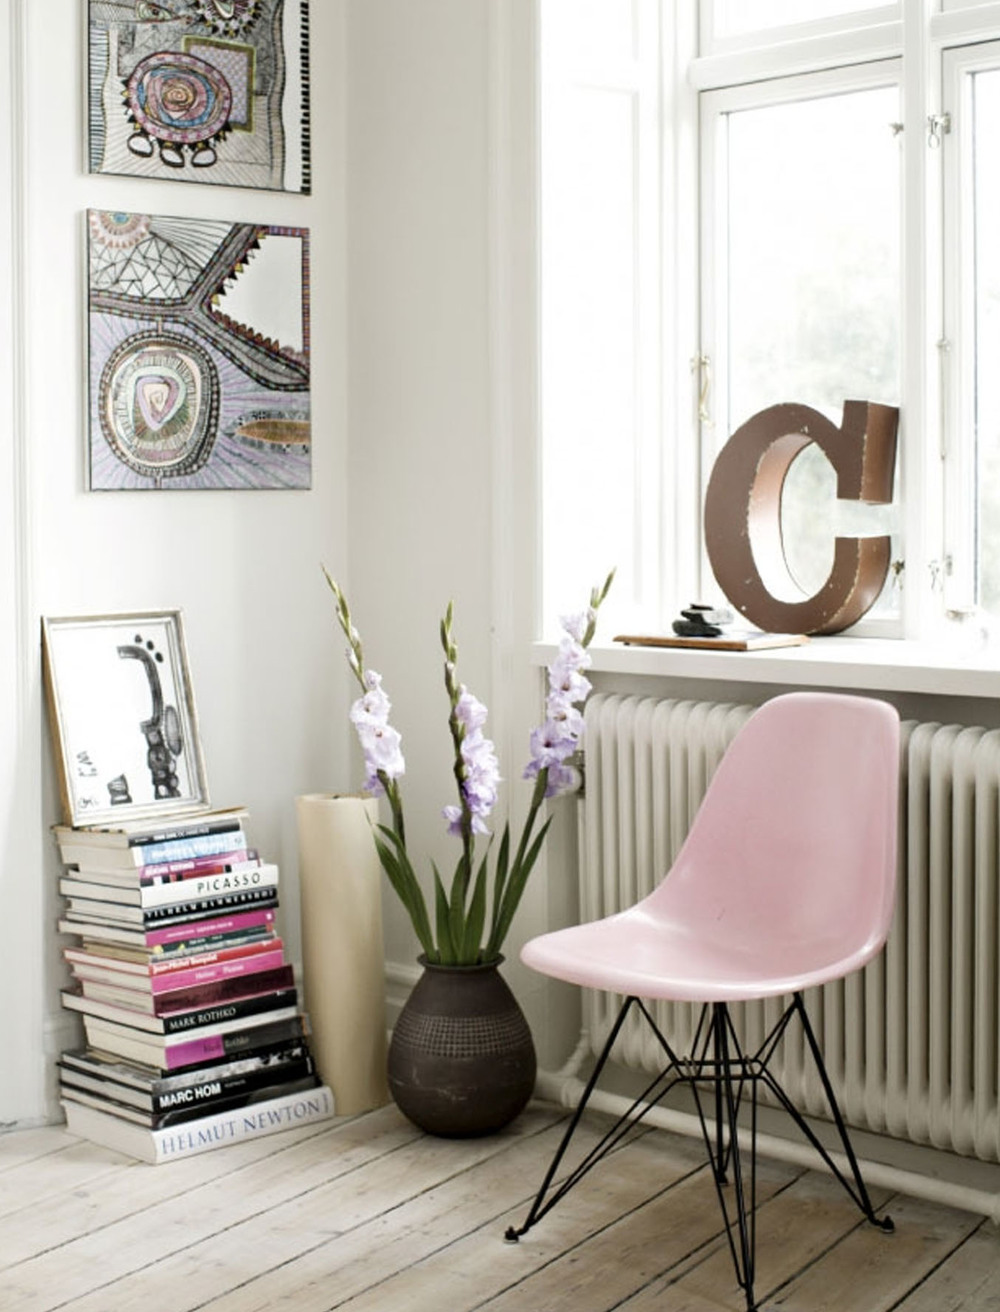 pinkblk_pinkchair.jpg